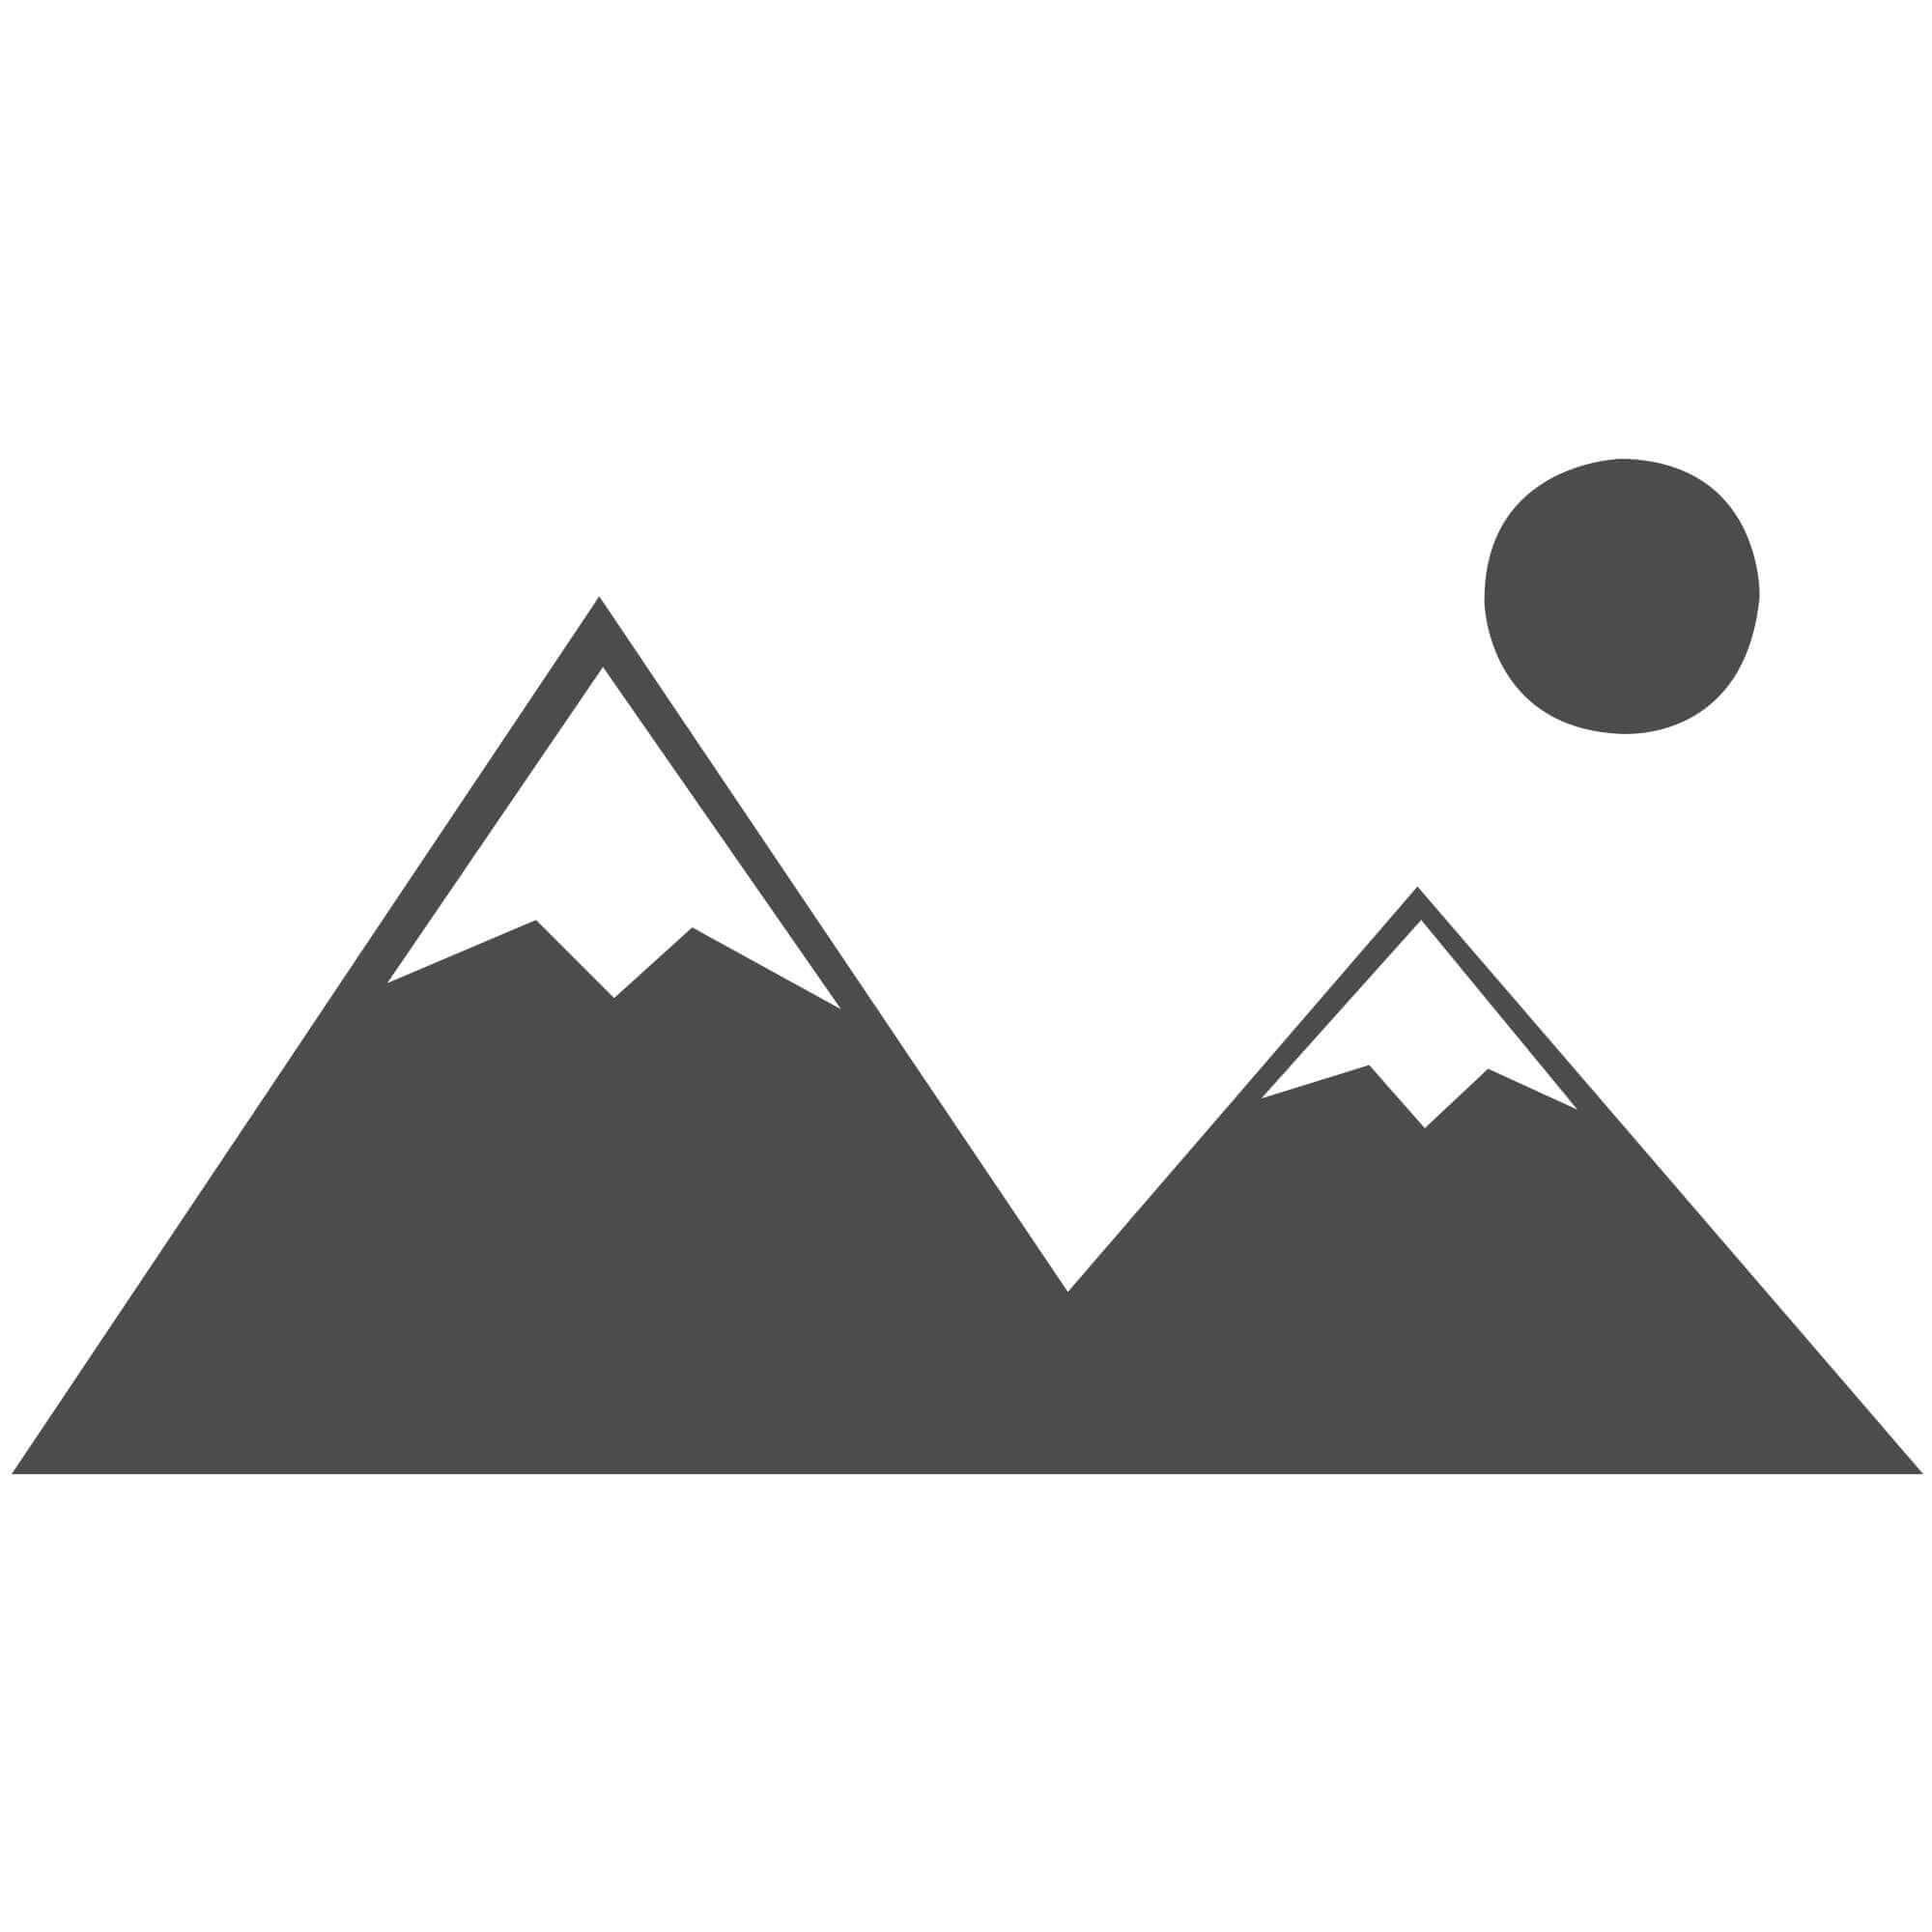 "Verge Furrow Pink Rug - Size 80 x 150 cm (2'8"" x 5')"